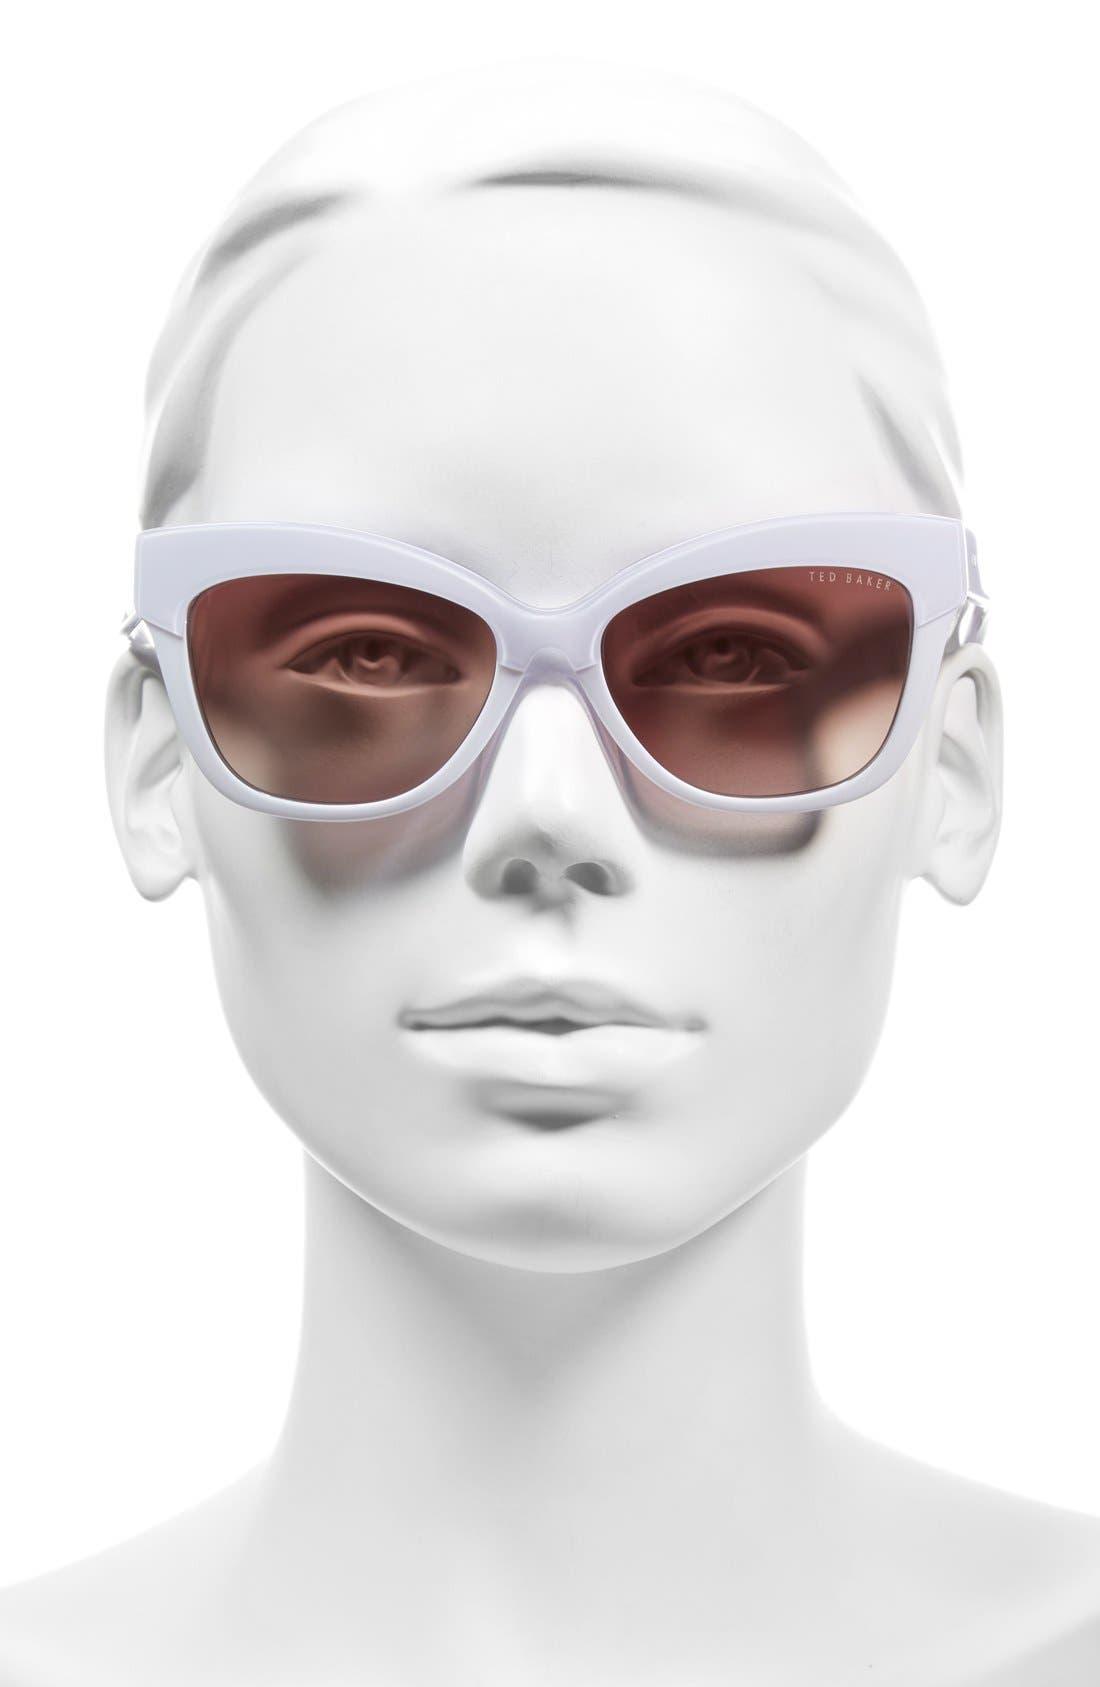 55mm Cat Eye Sunglasses,                             Alternate thumbnail 2, color,                             100